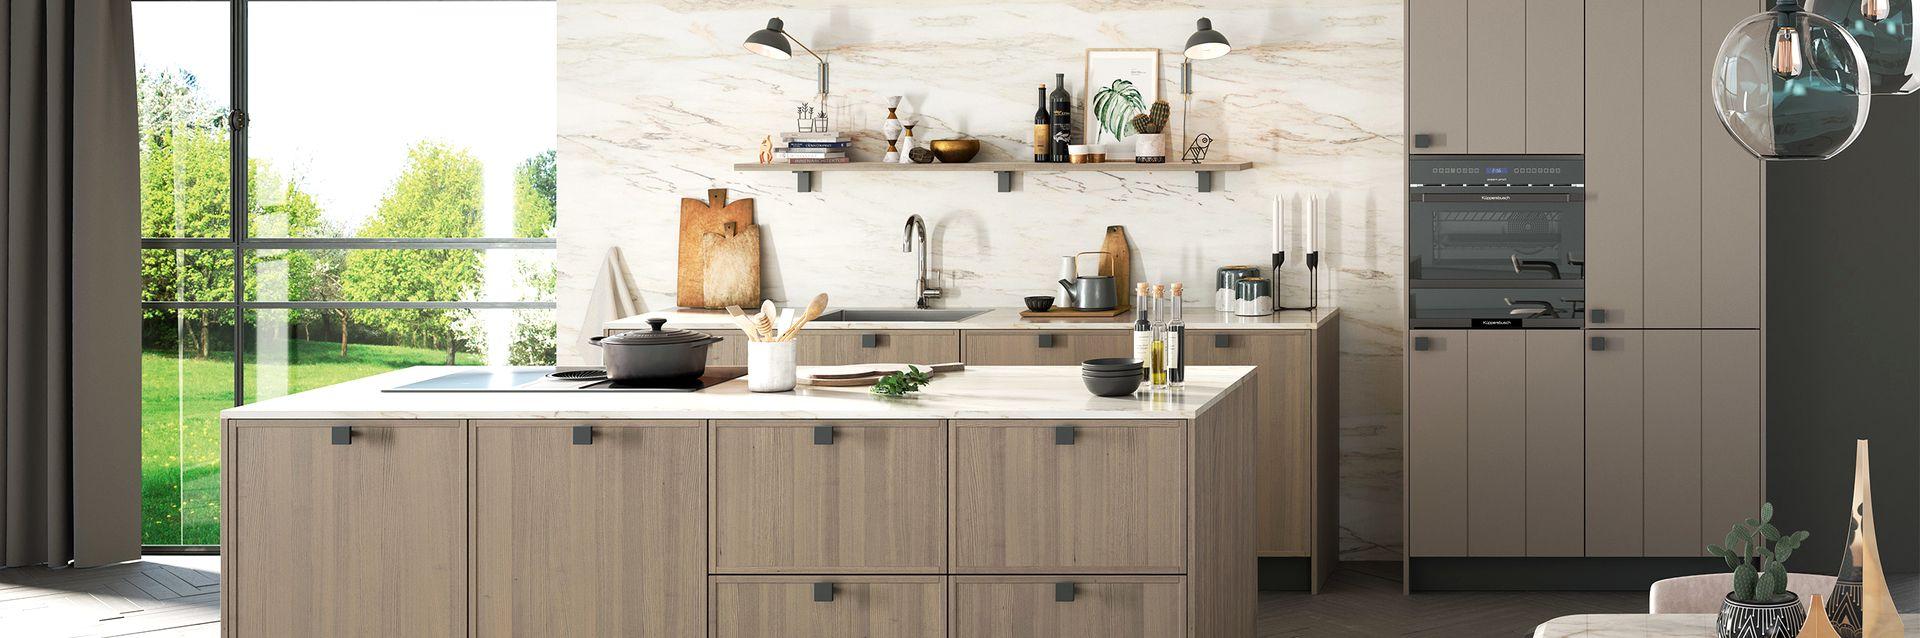 Vacature keukenmonteur - Vacature keukenmonteur